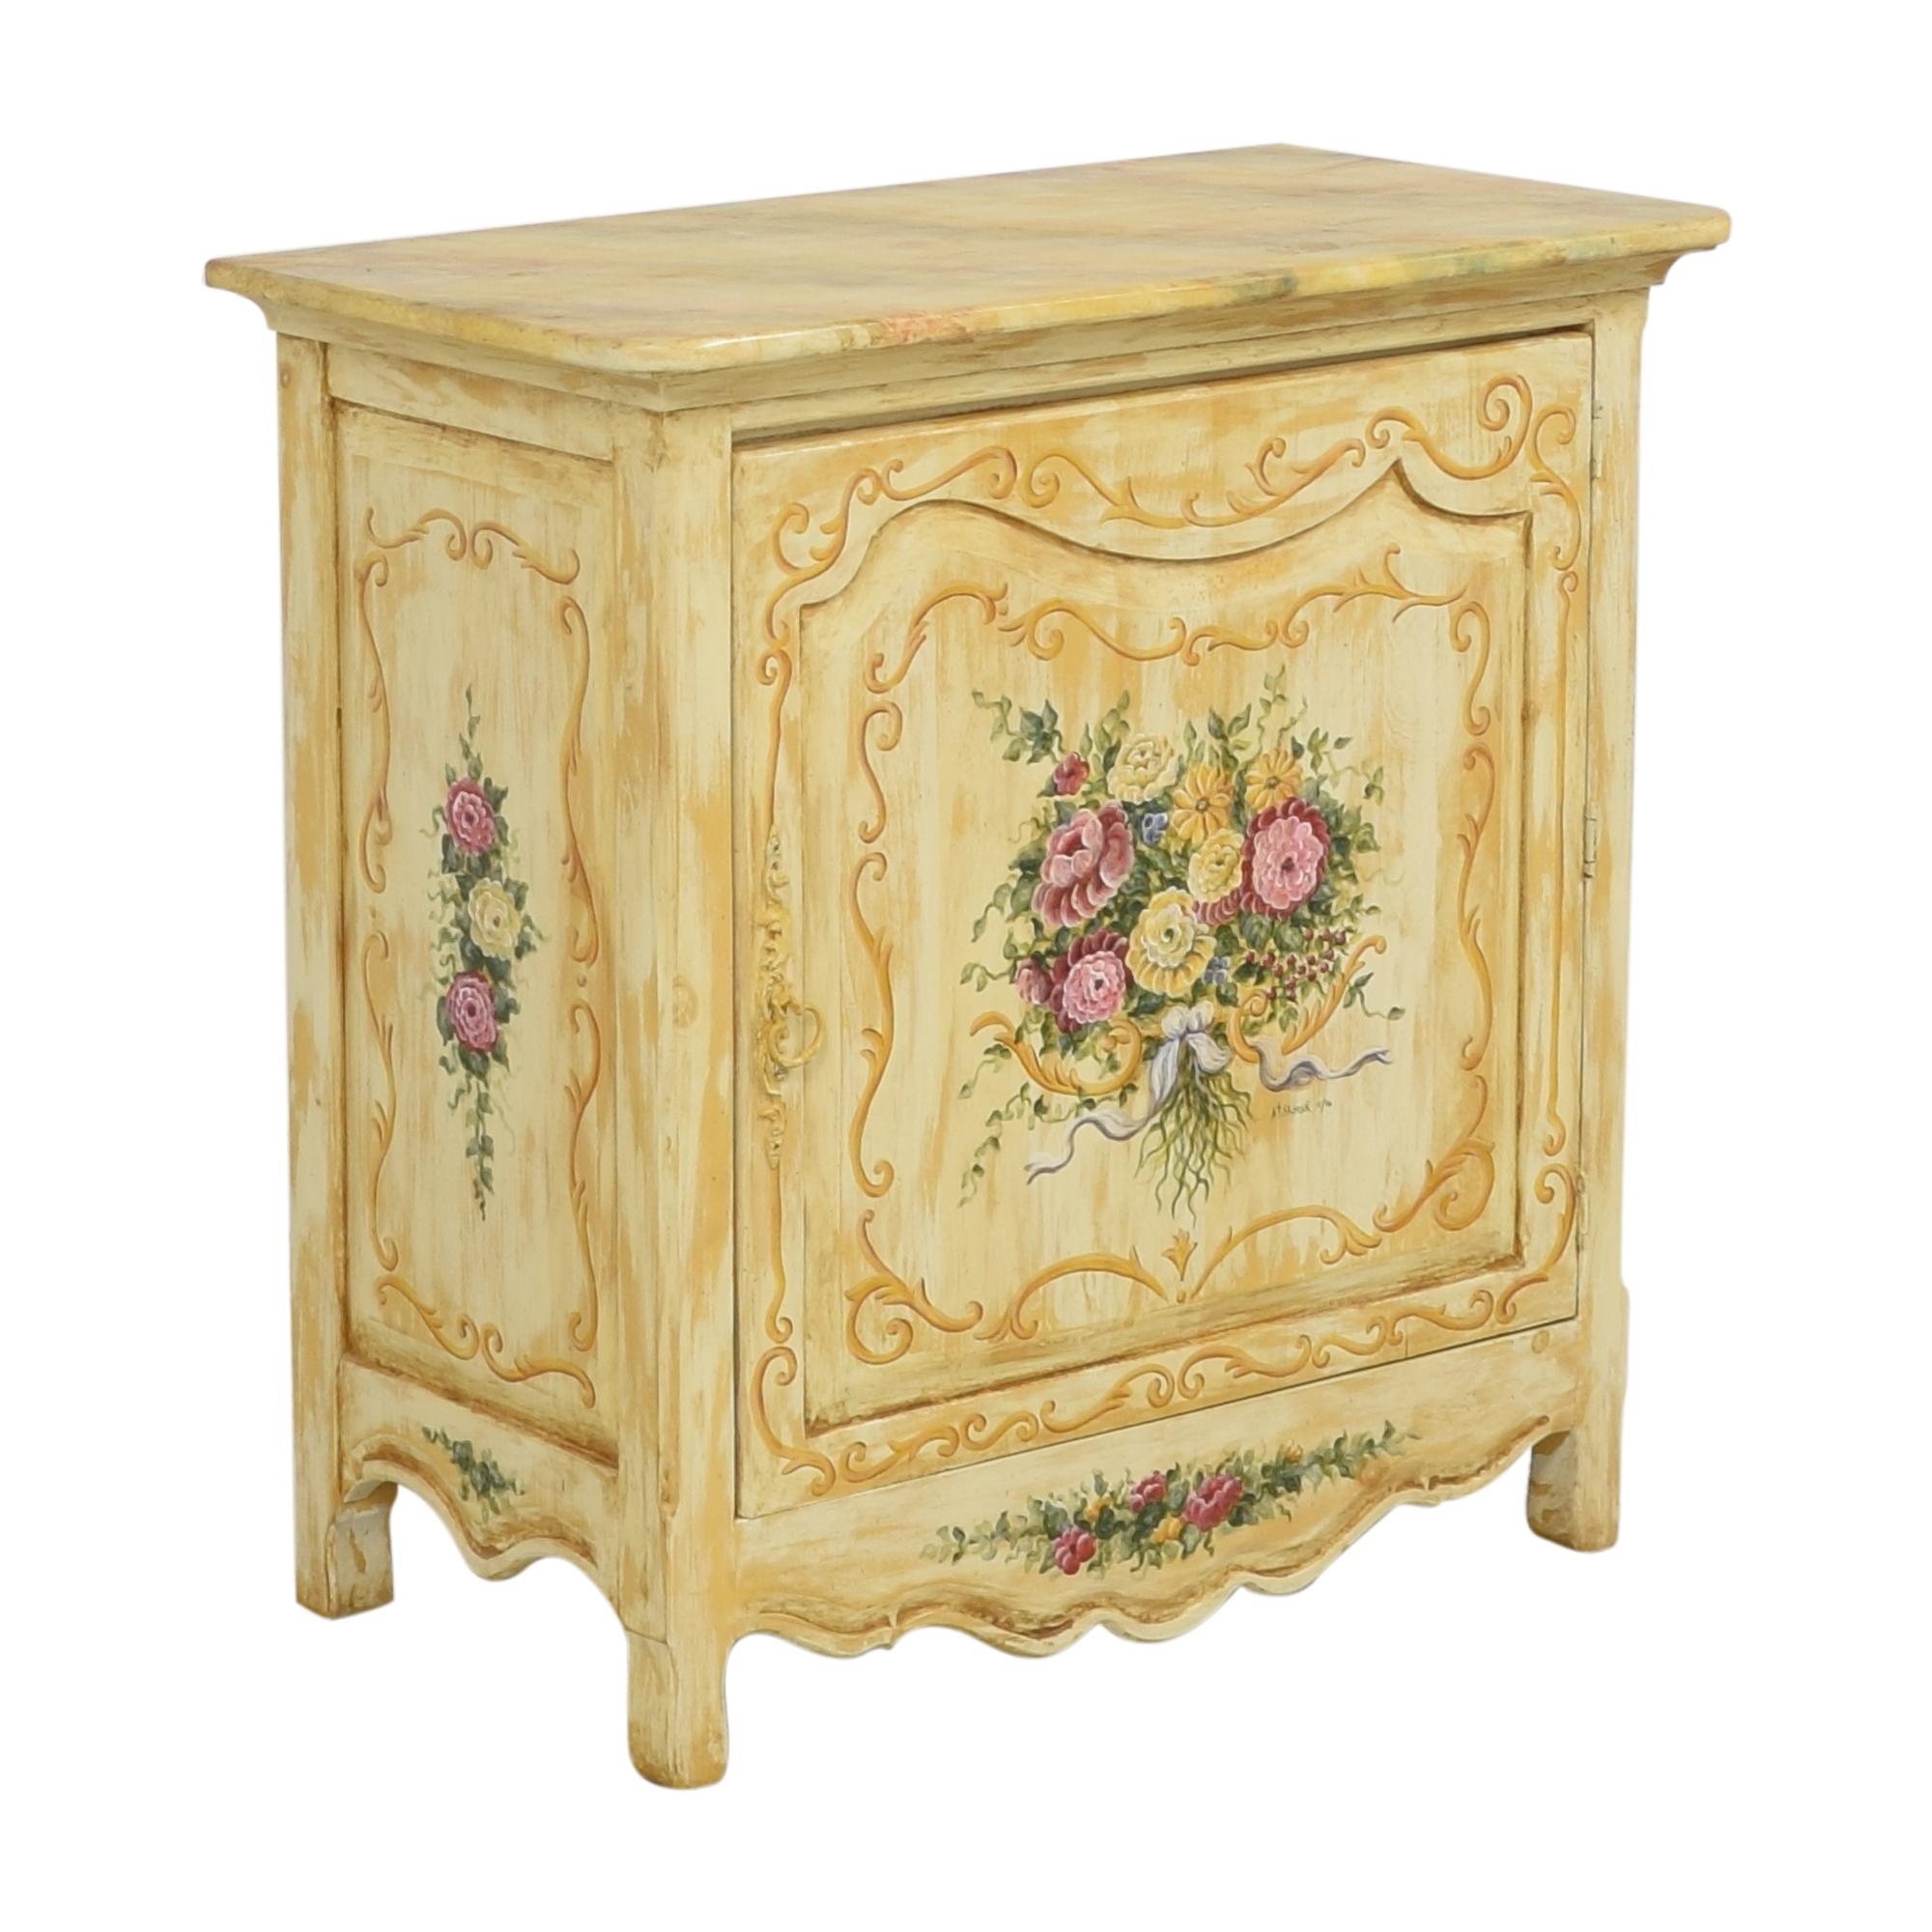 Habersham Habersham Antique-Style Side Table on sale